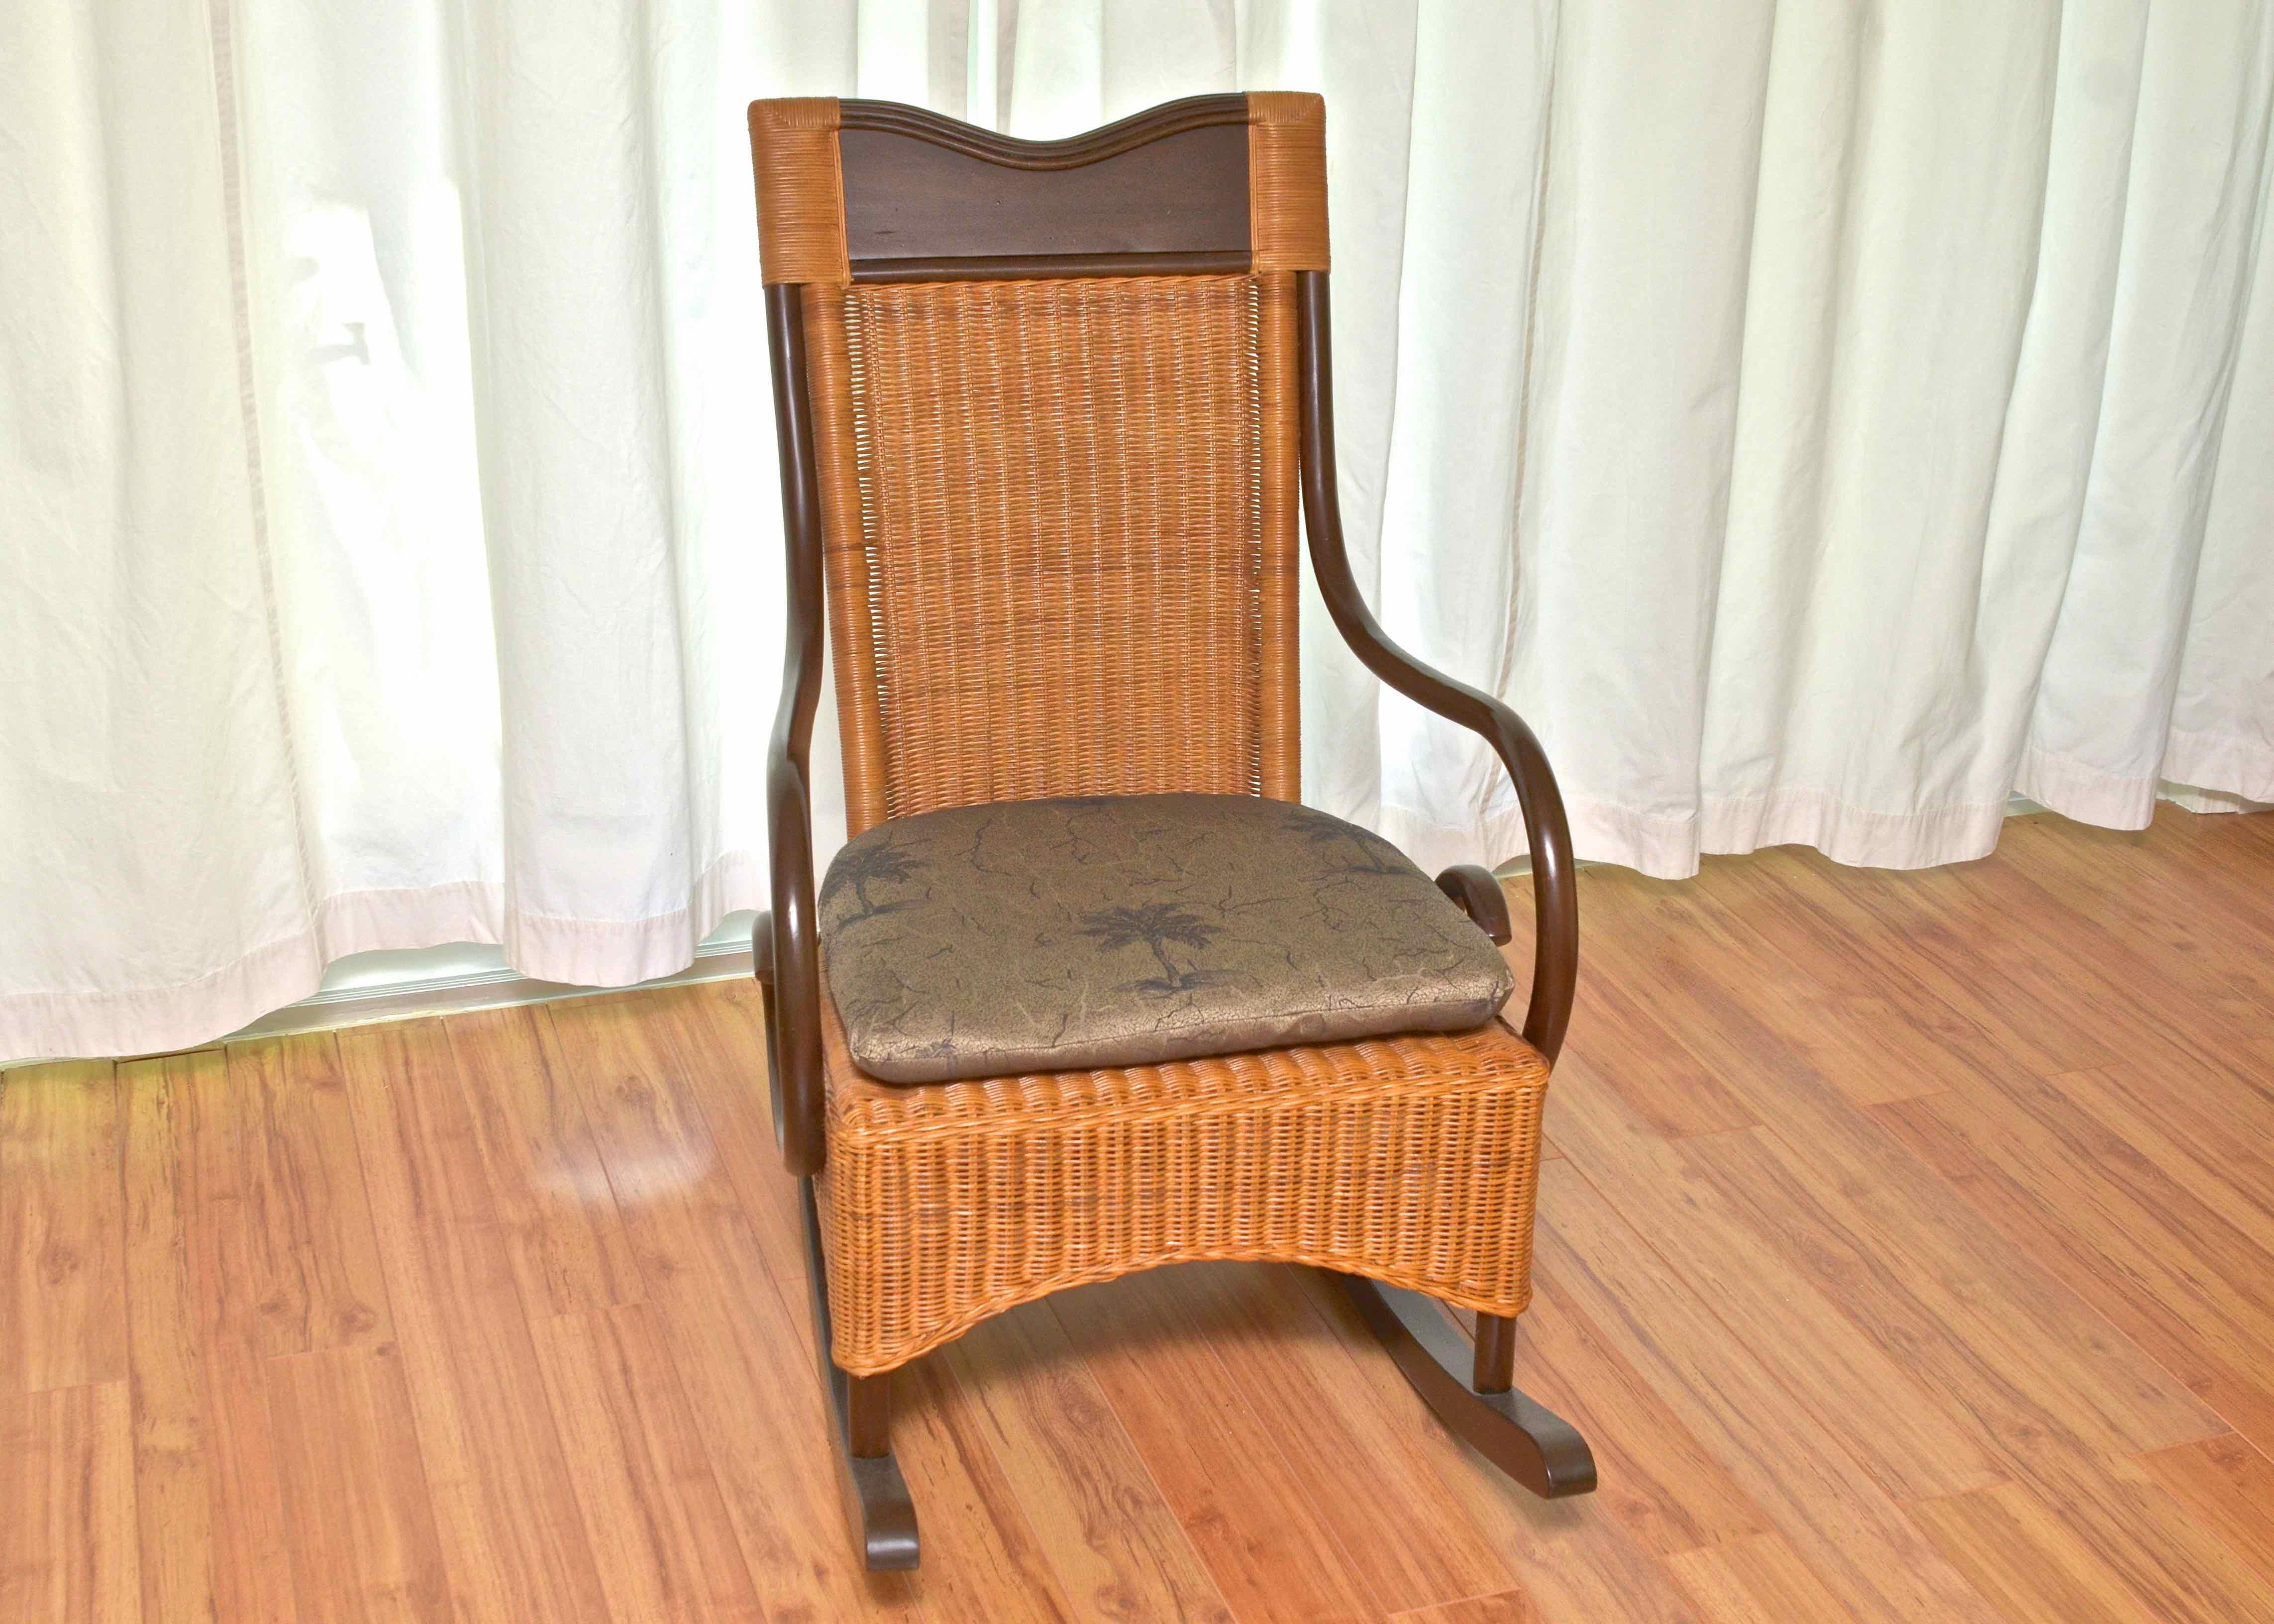 wicker rocking chair pier one luxury high chairs for babies 1 rocker ebth